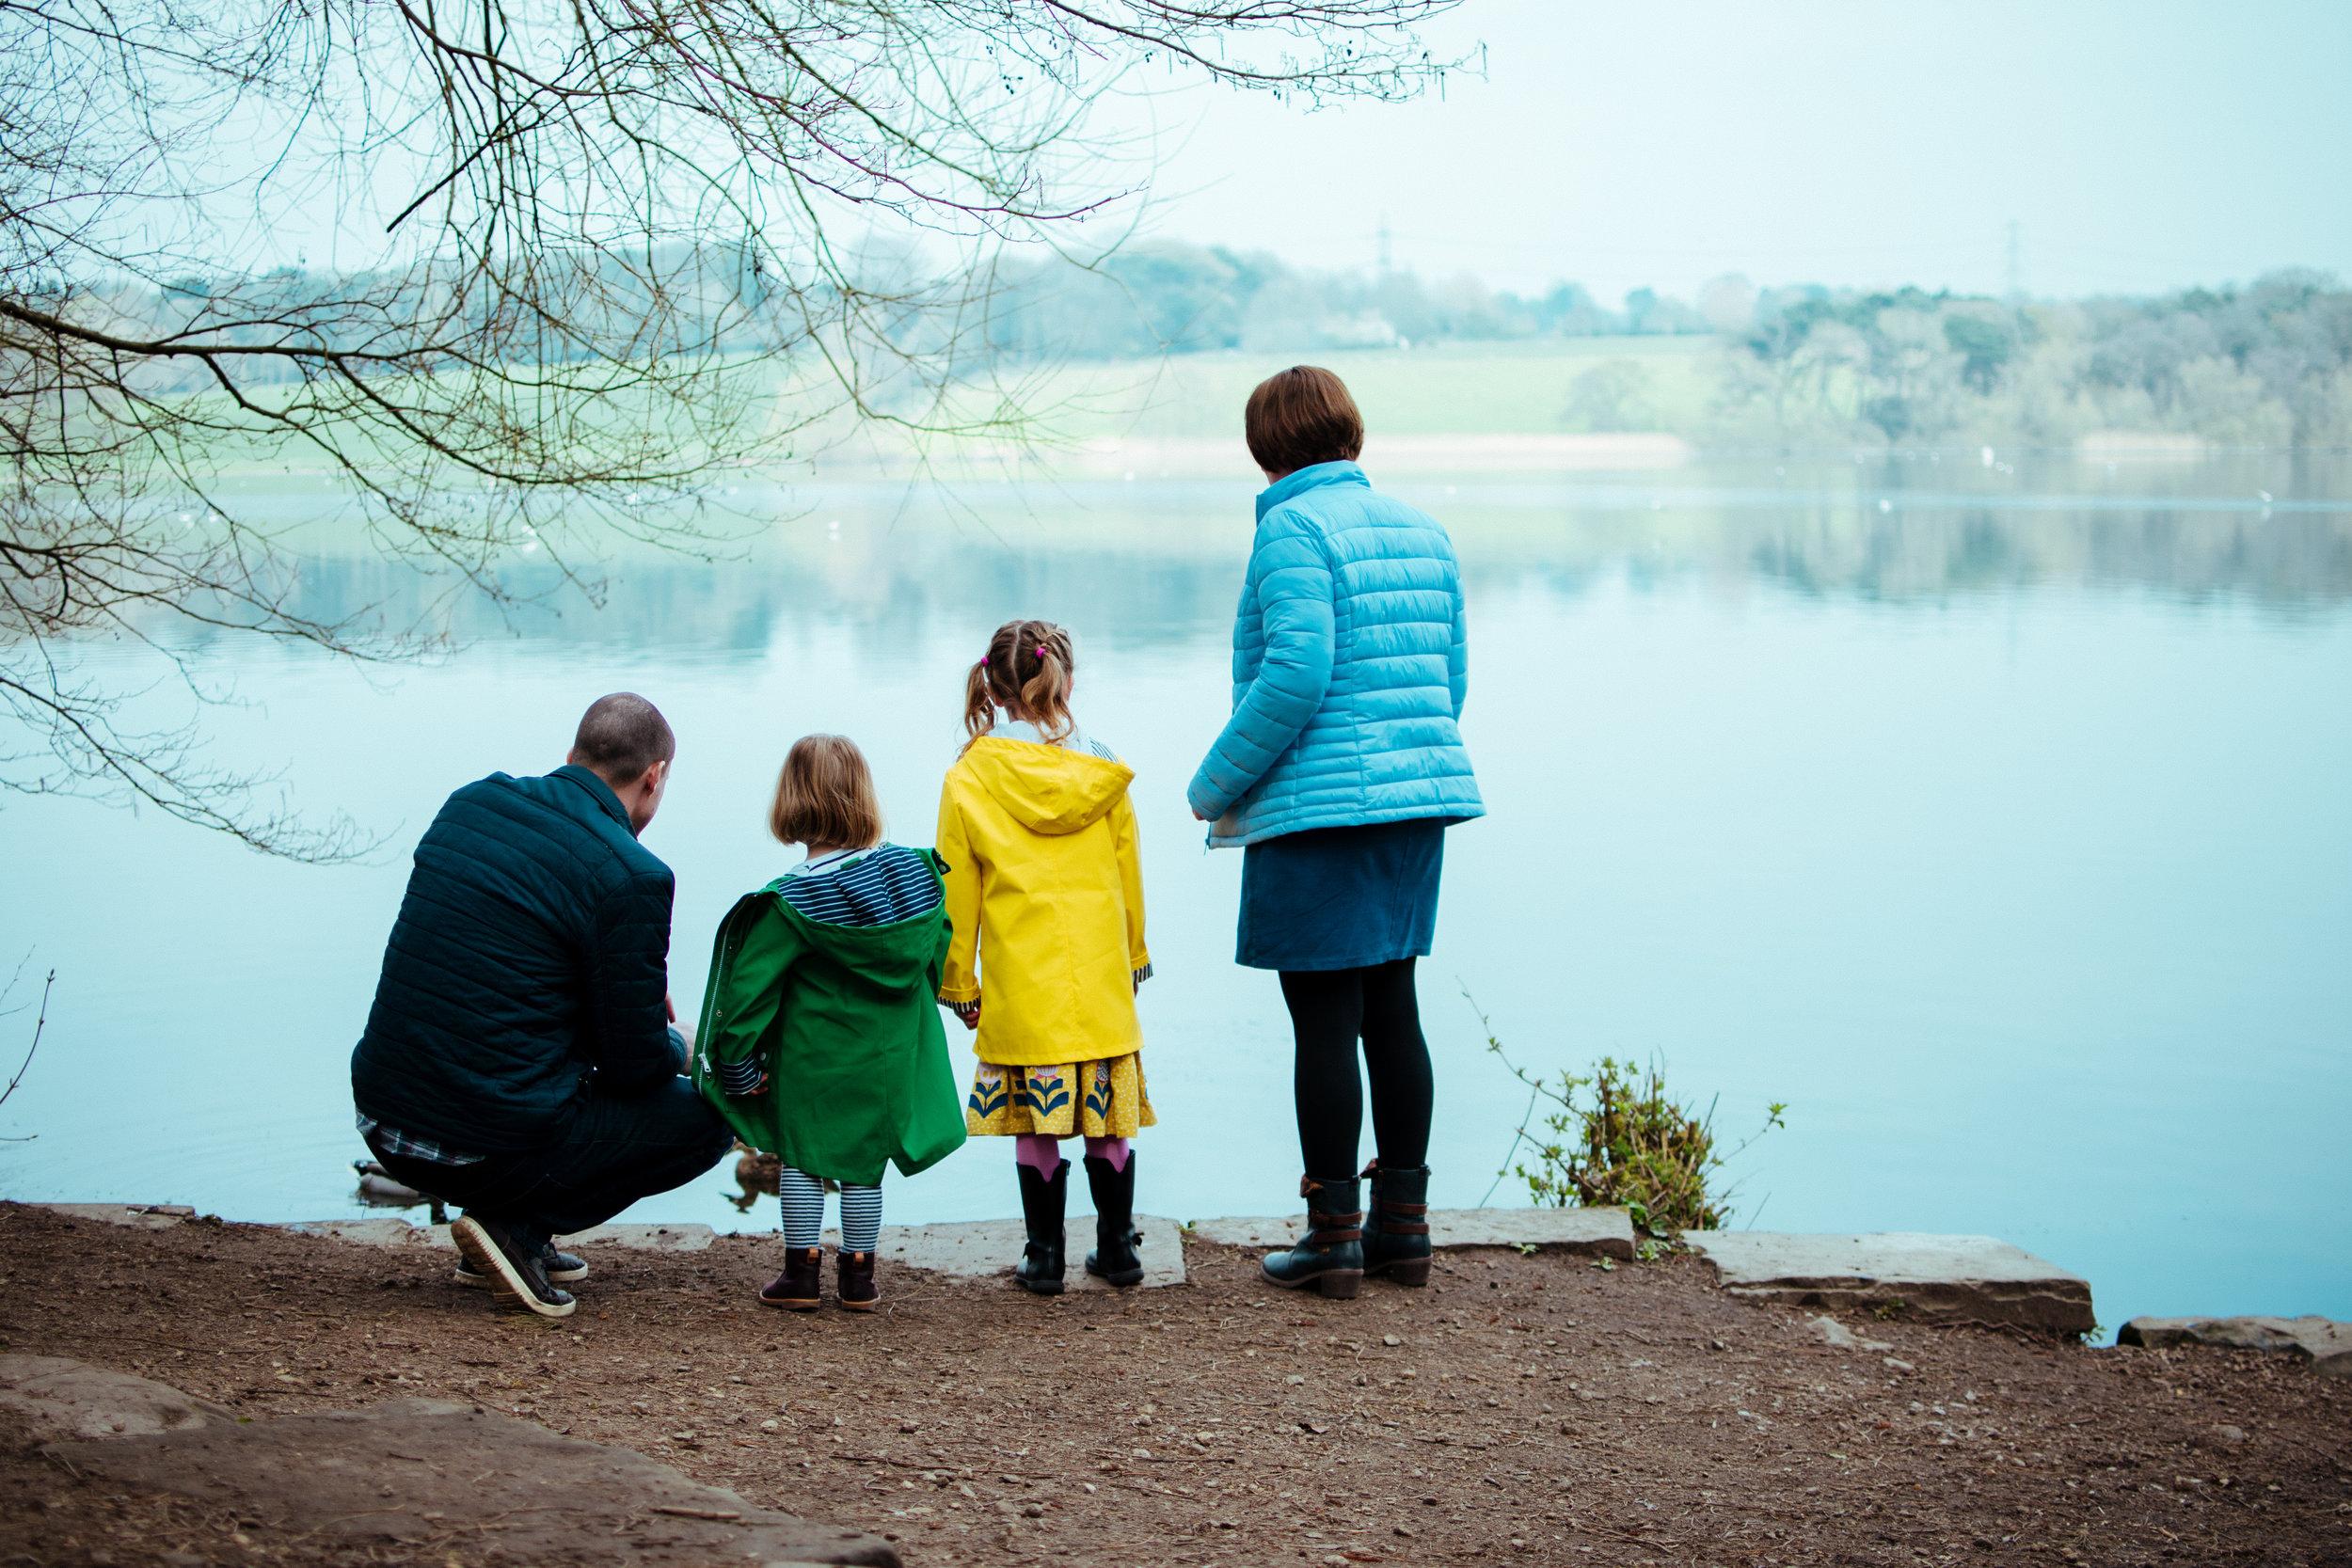 family photographer, Cheshire family photographer, northwest family photographer, family, Manchester family photographer, Liverpool portrait photographer